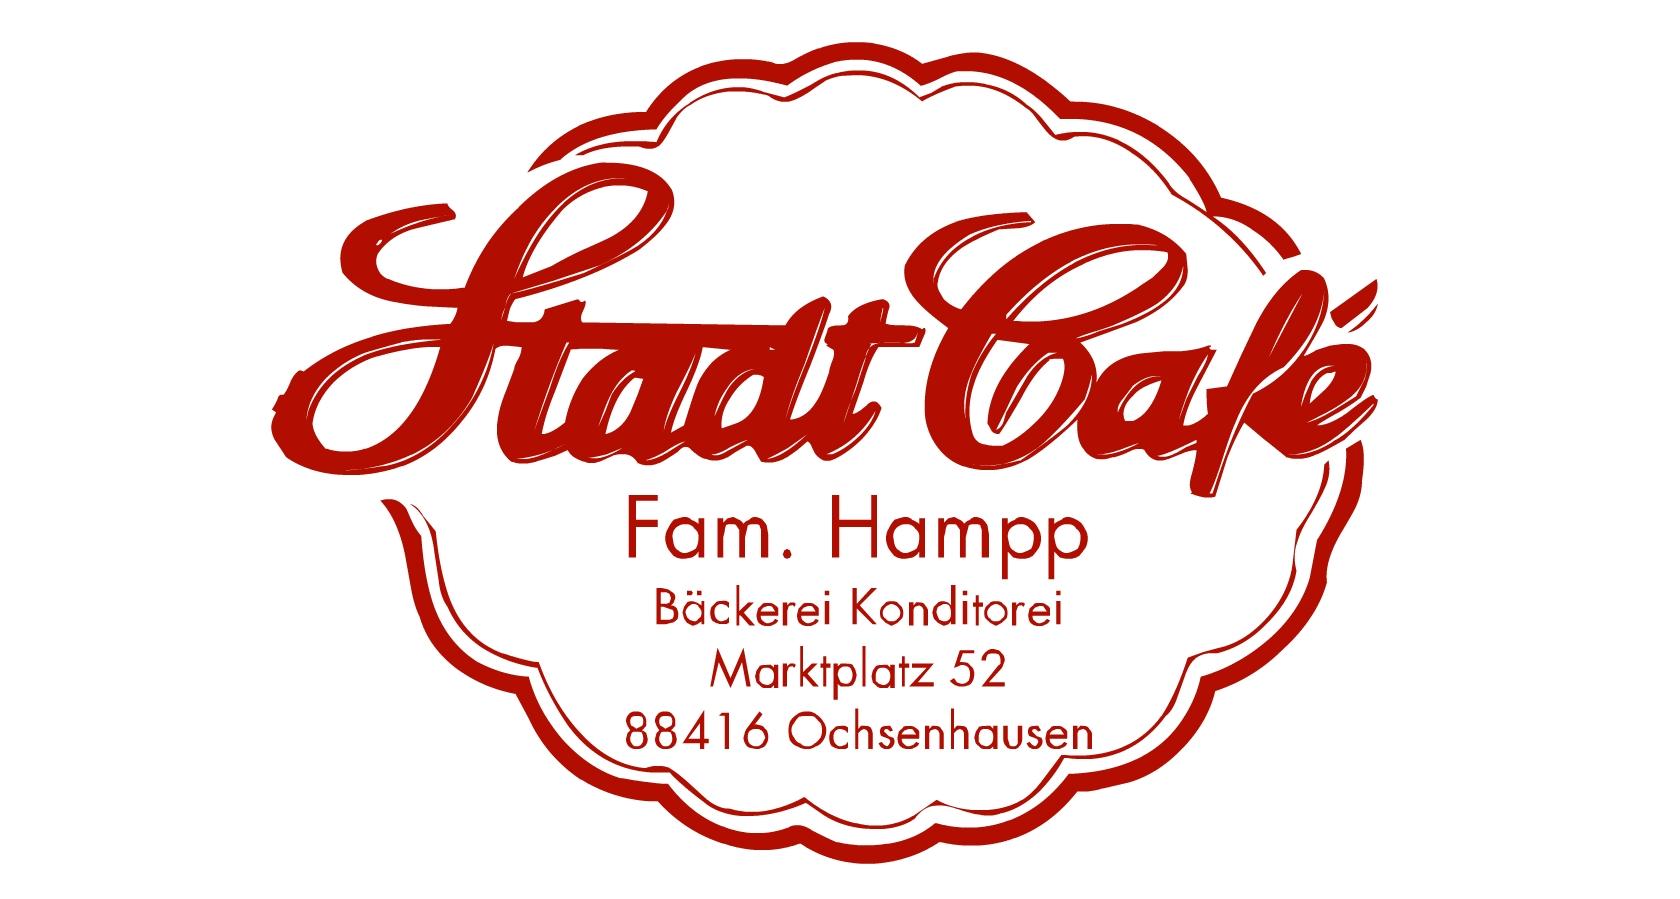 Stadt Cafe